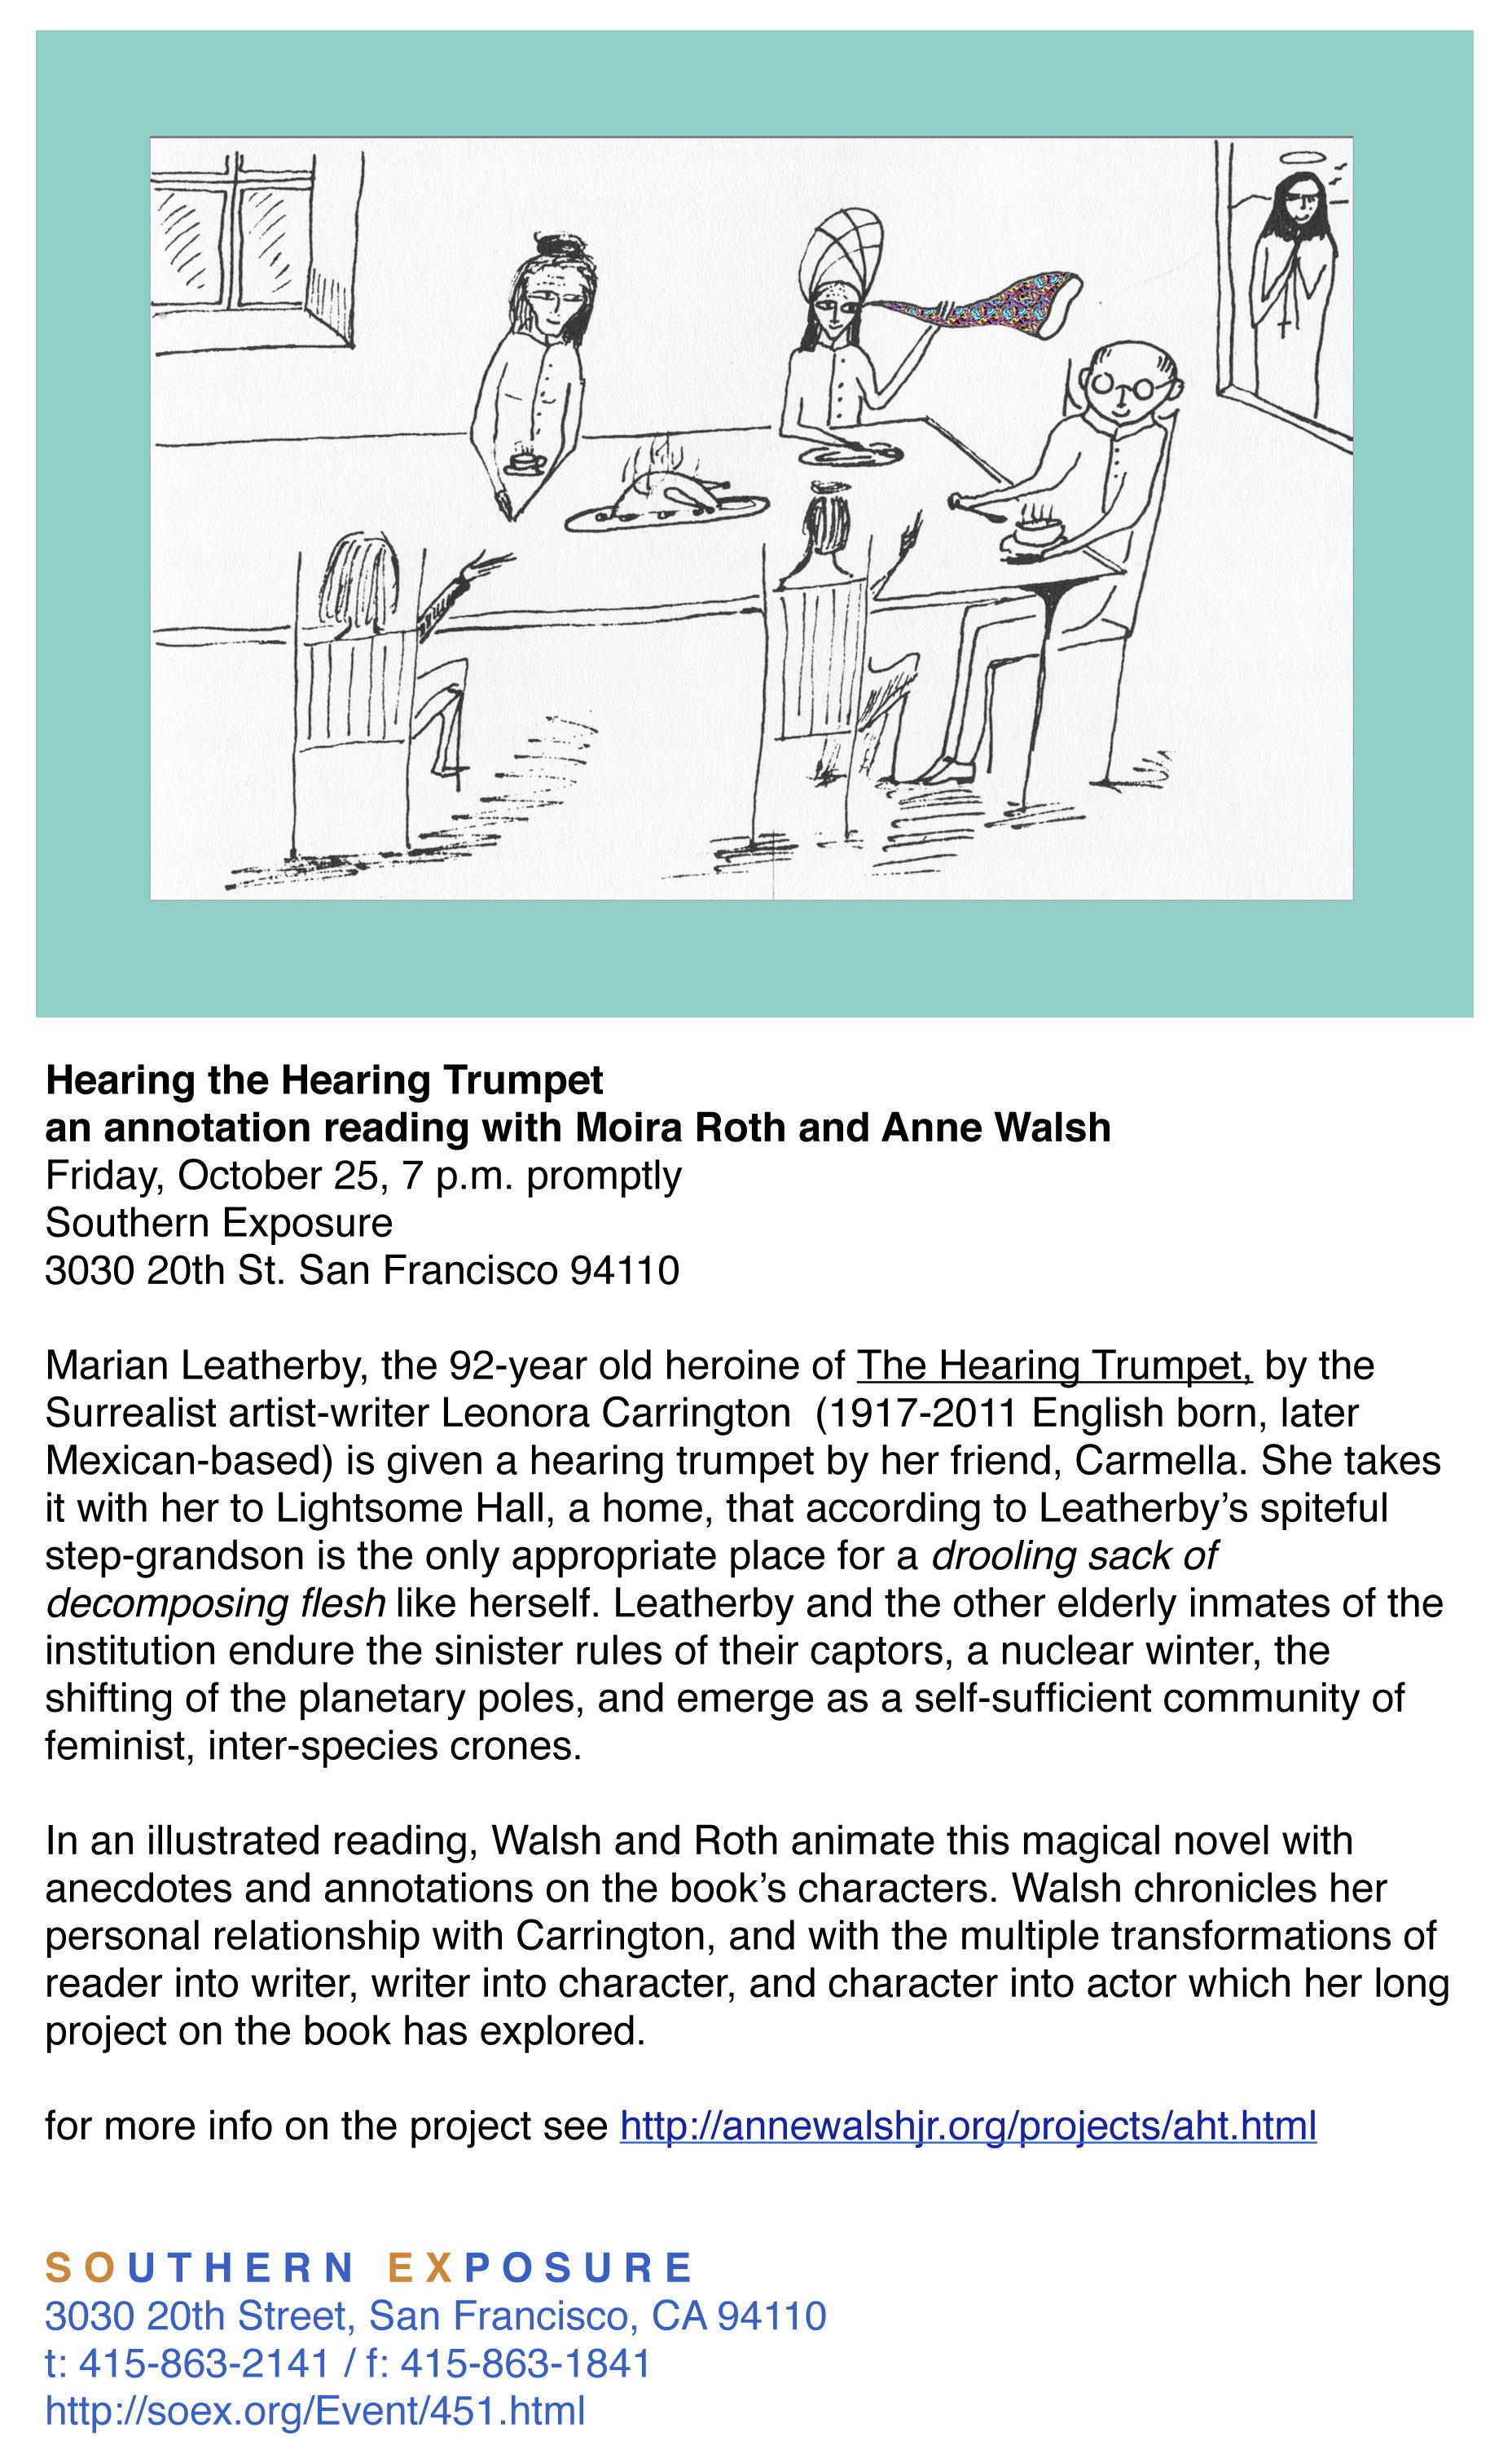 Soex_HearingTrumpet.jpg